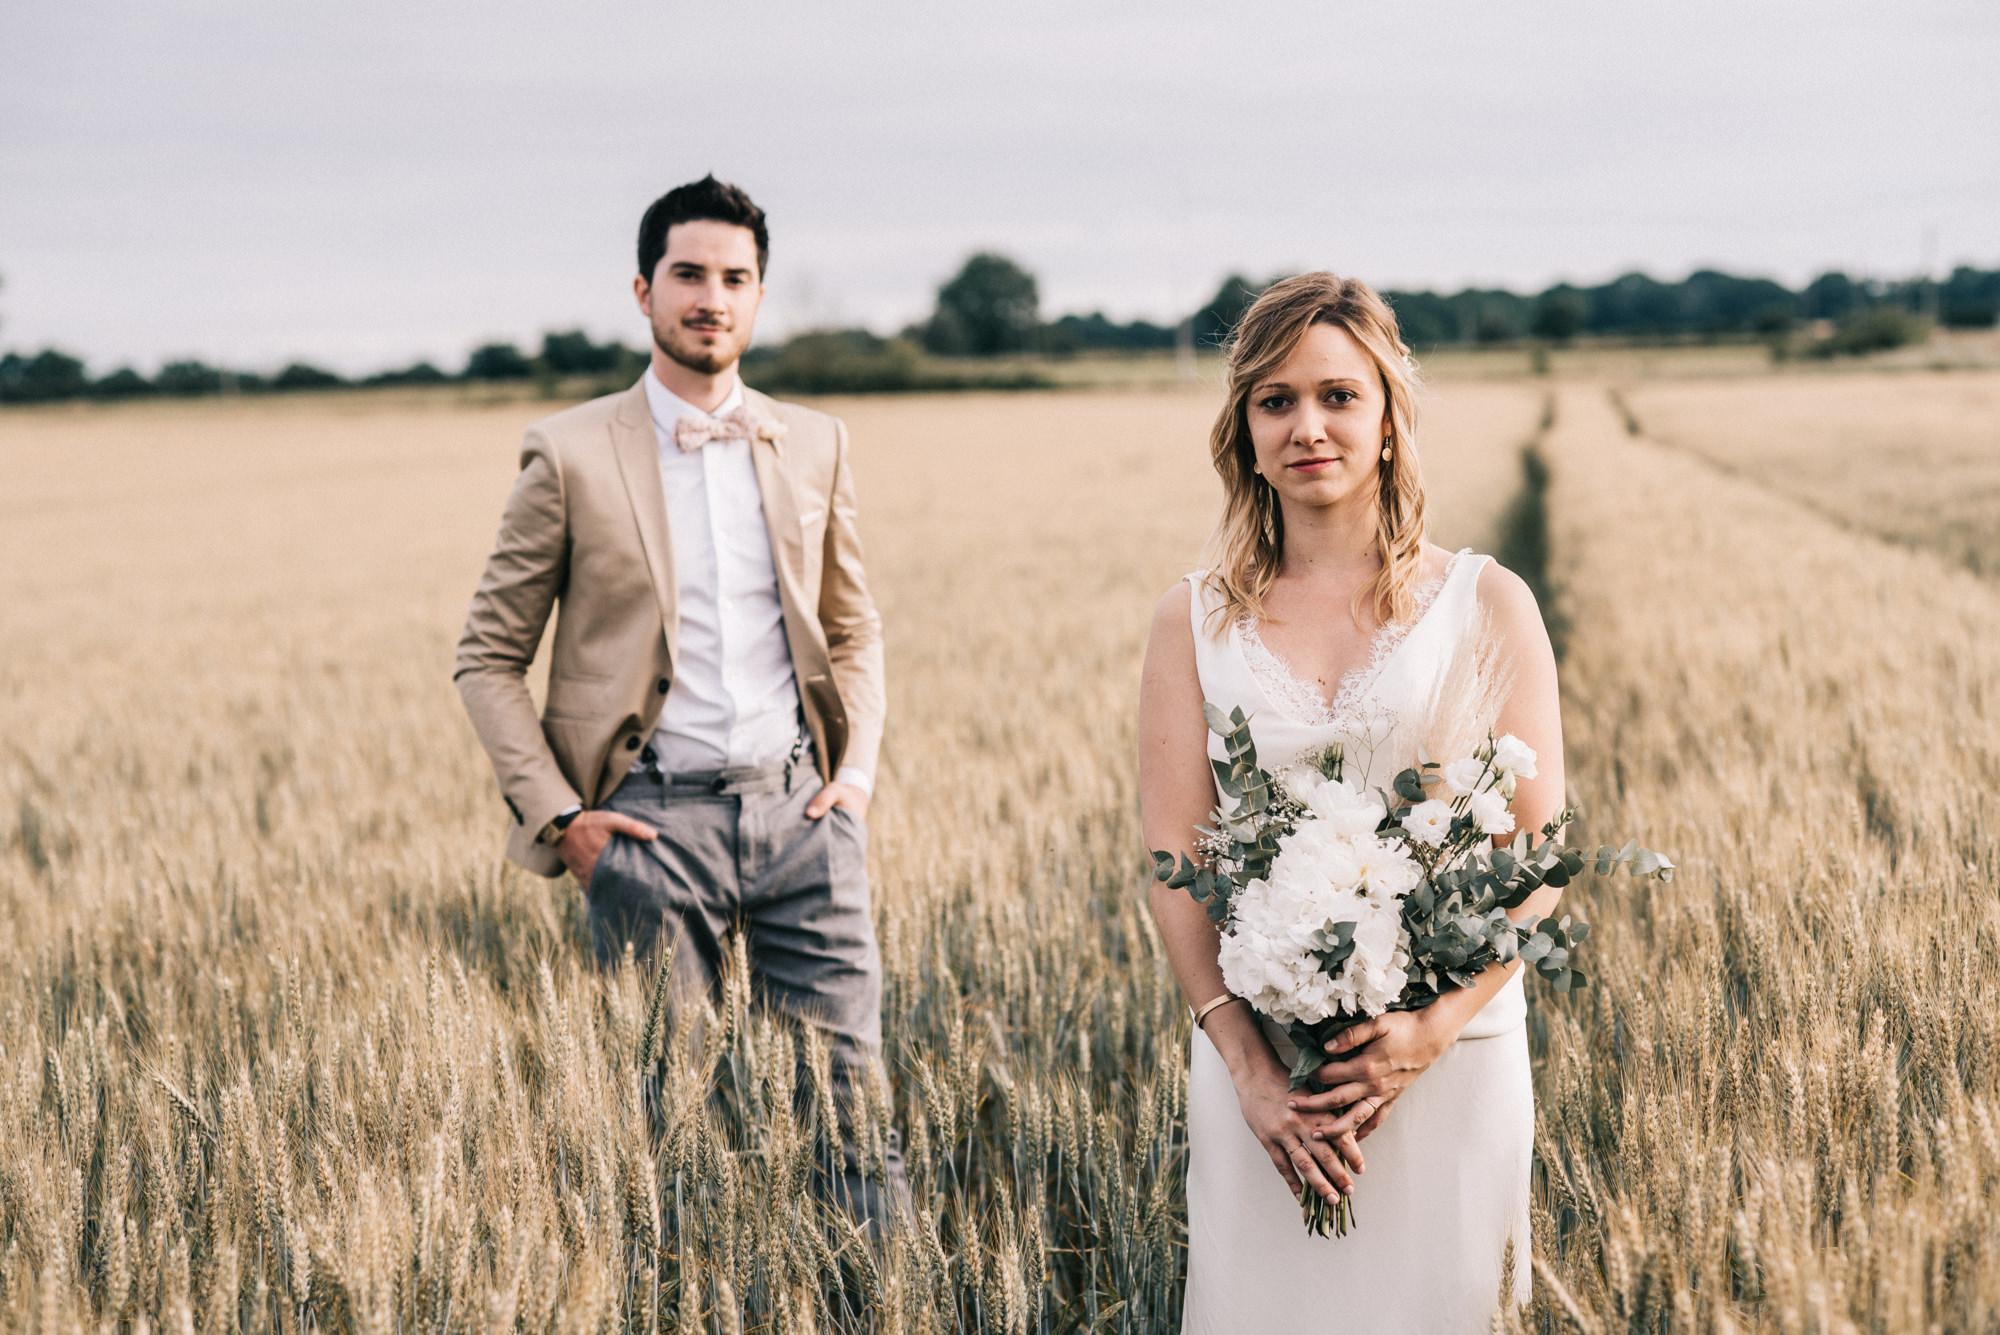 photographe mariage angers 49